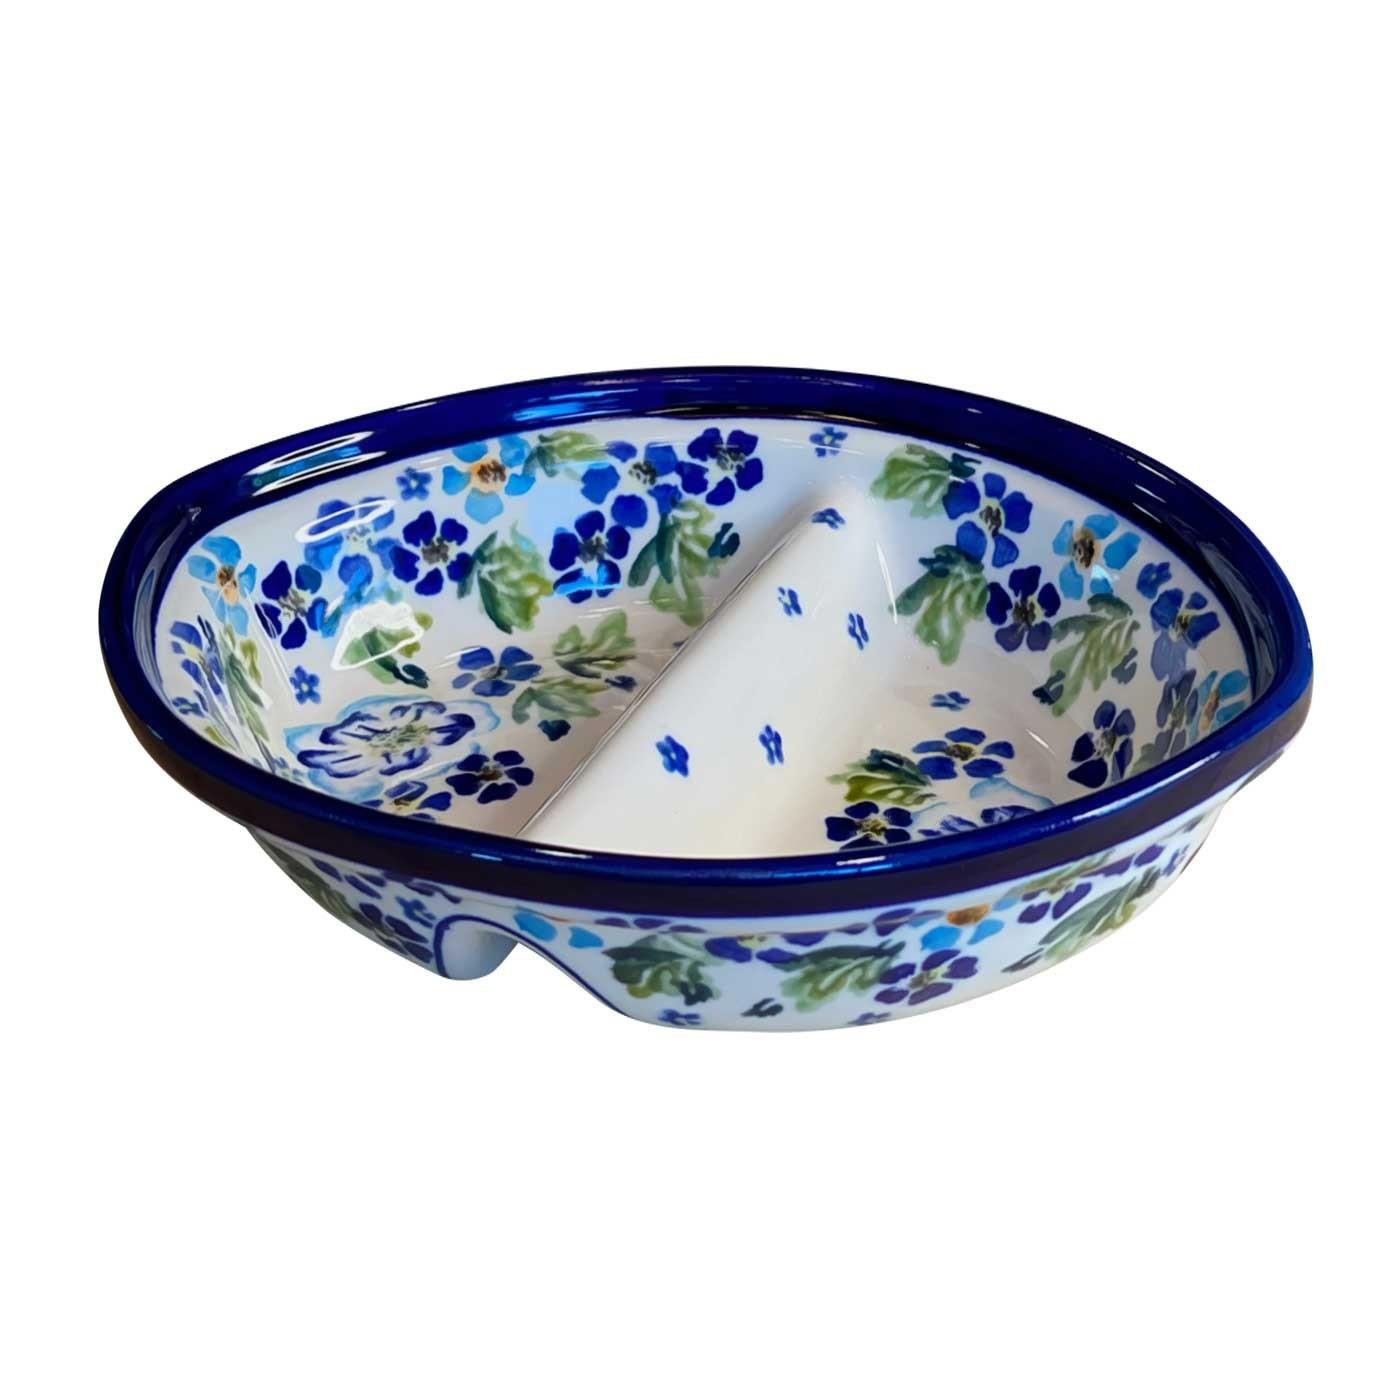 Pottery Avenue True Blues Stoneware Divided Dish